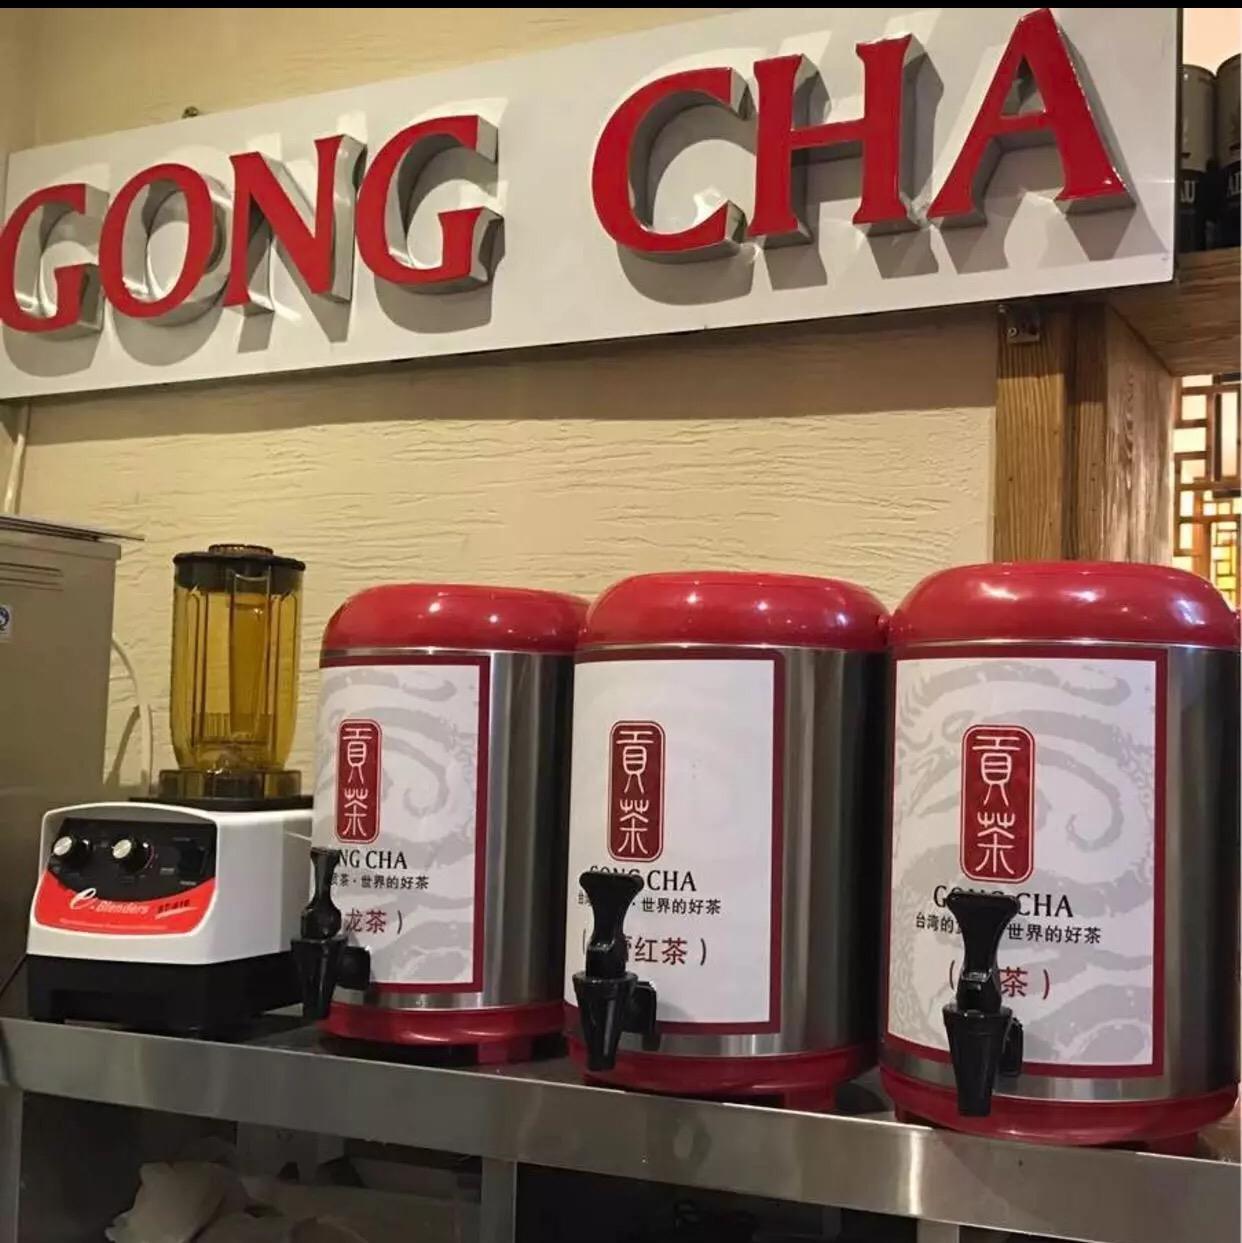 GONG CHA贡茶